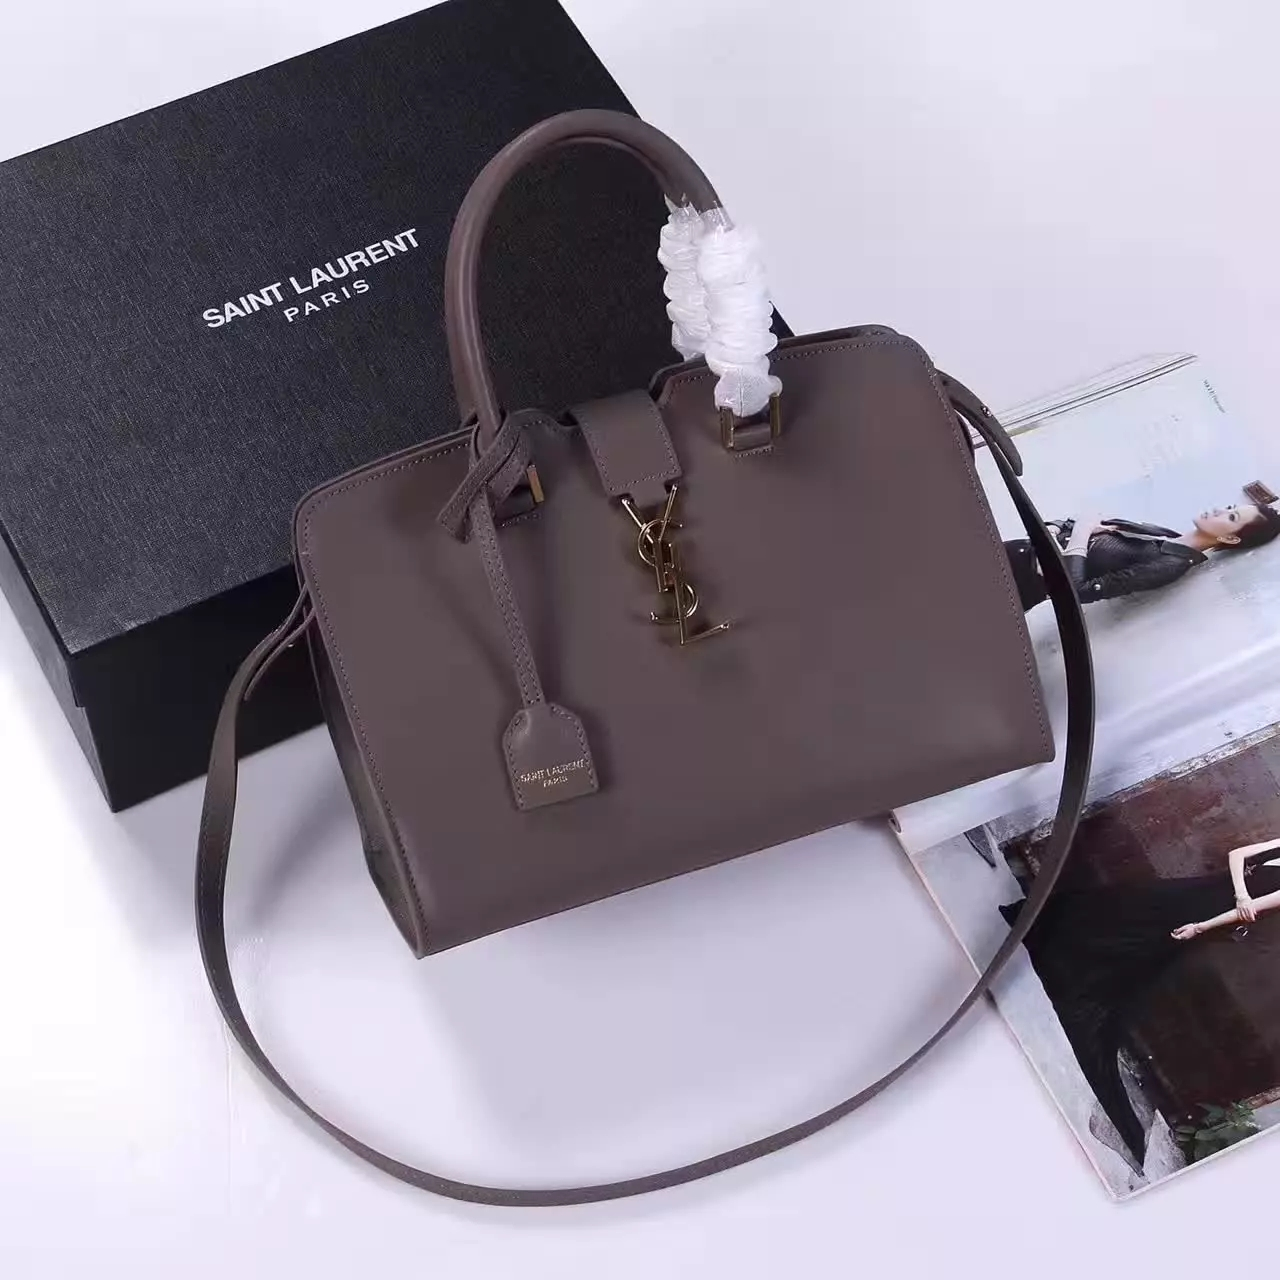 YSL Monogram Saint Laurent Cabas Bag Grey